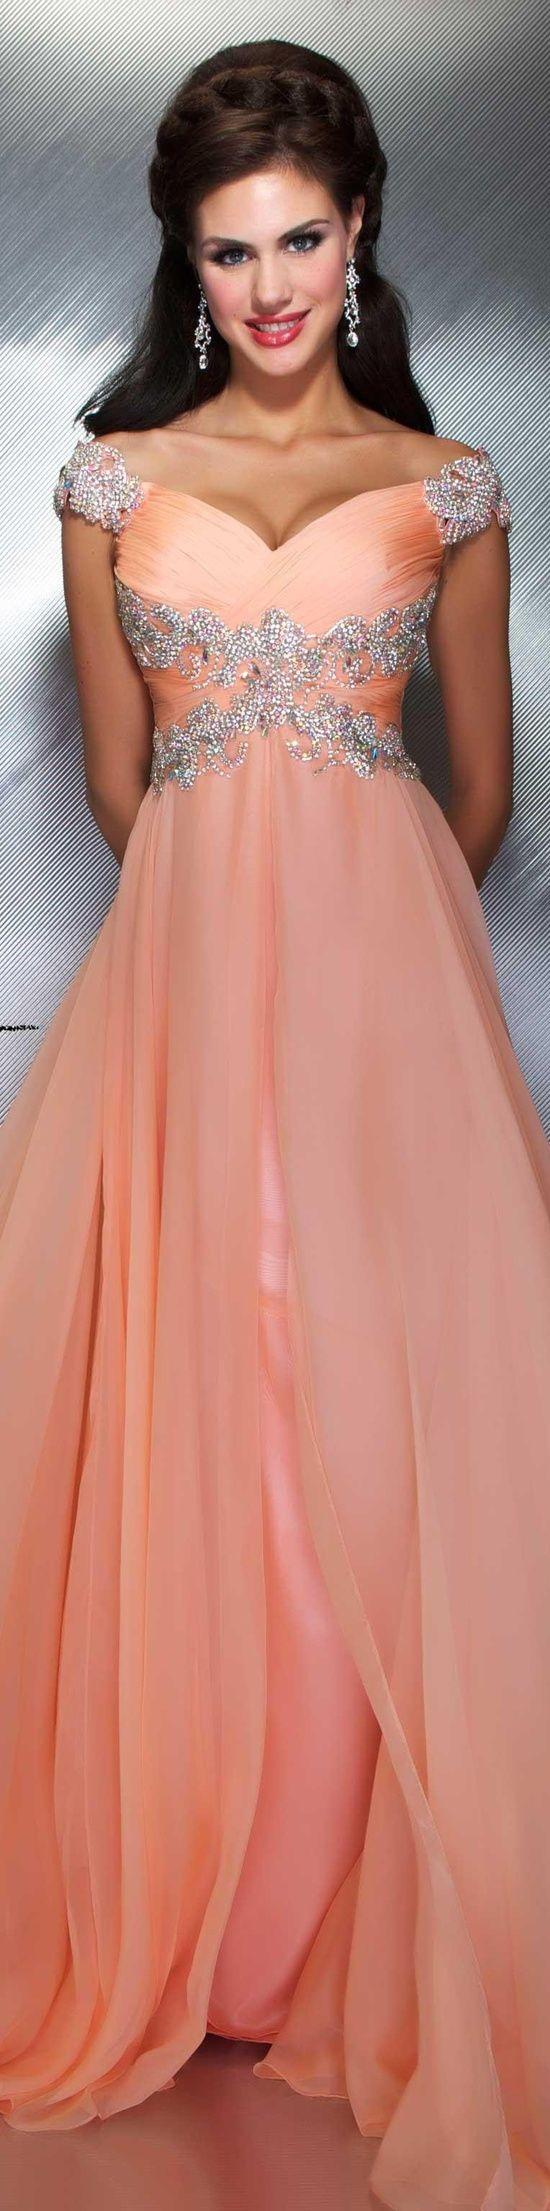 peach dress | Moda | Pinterest